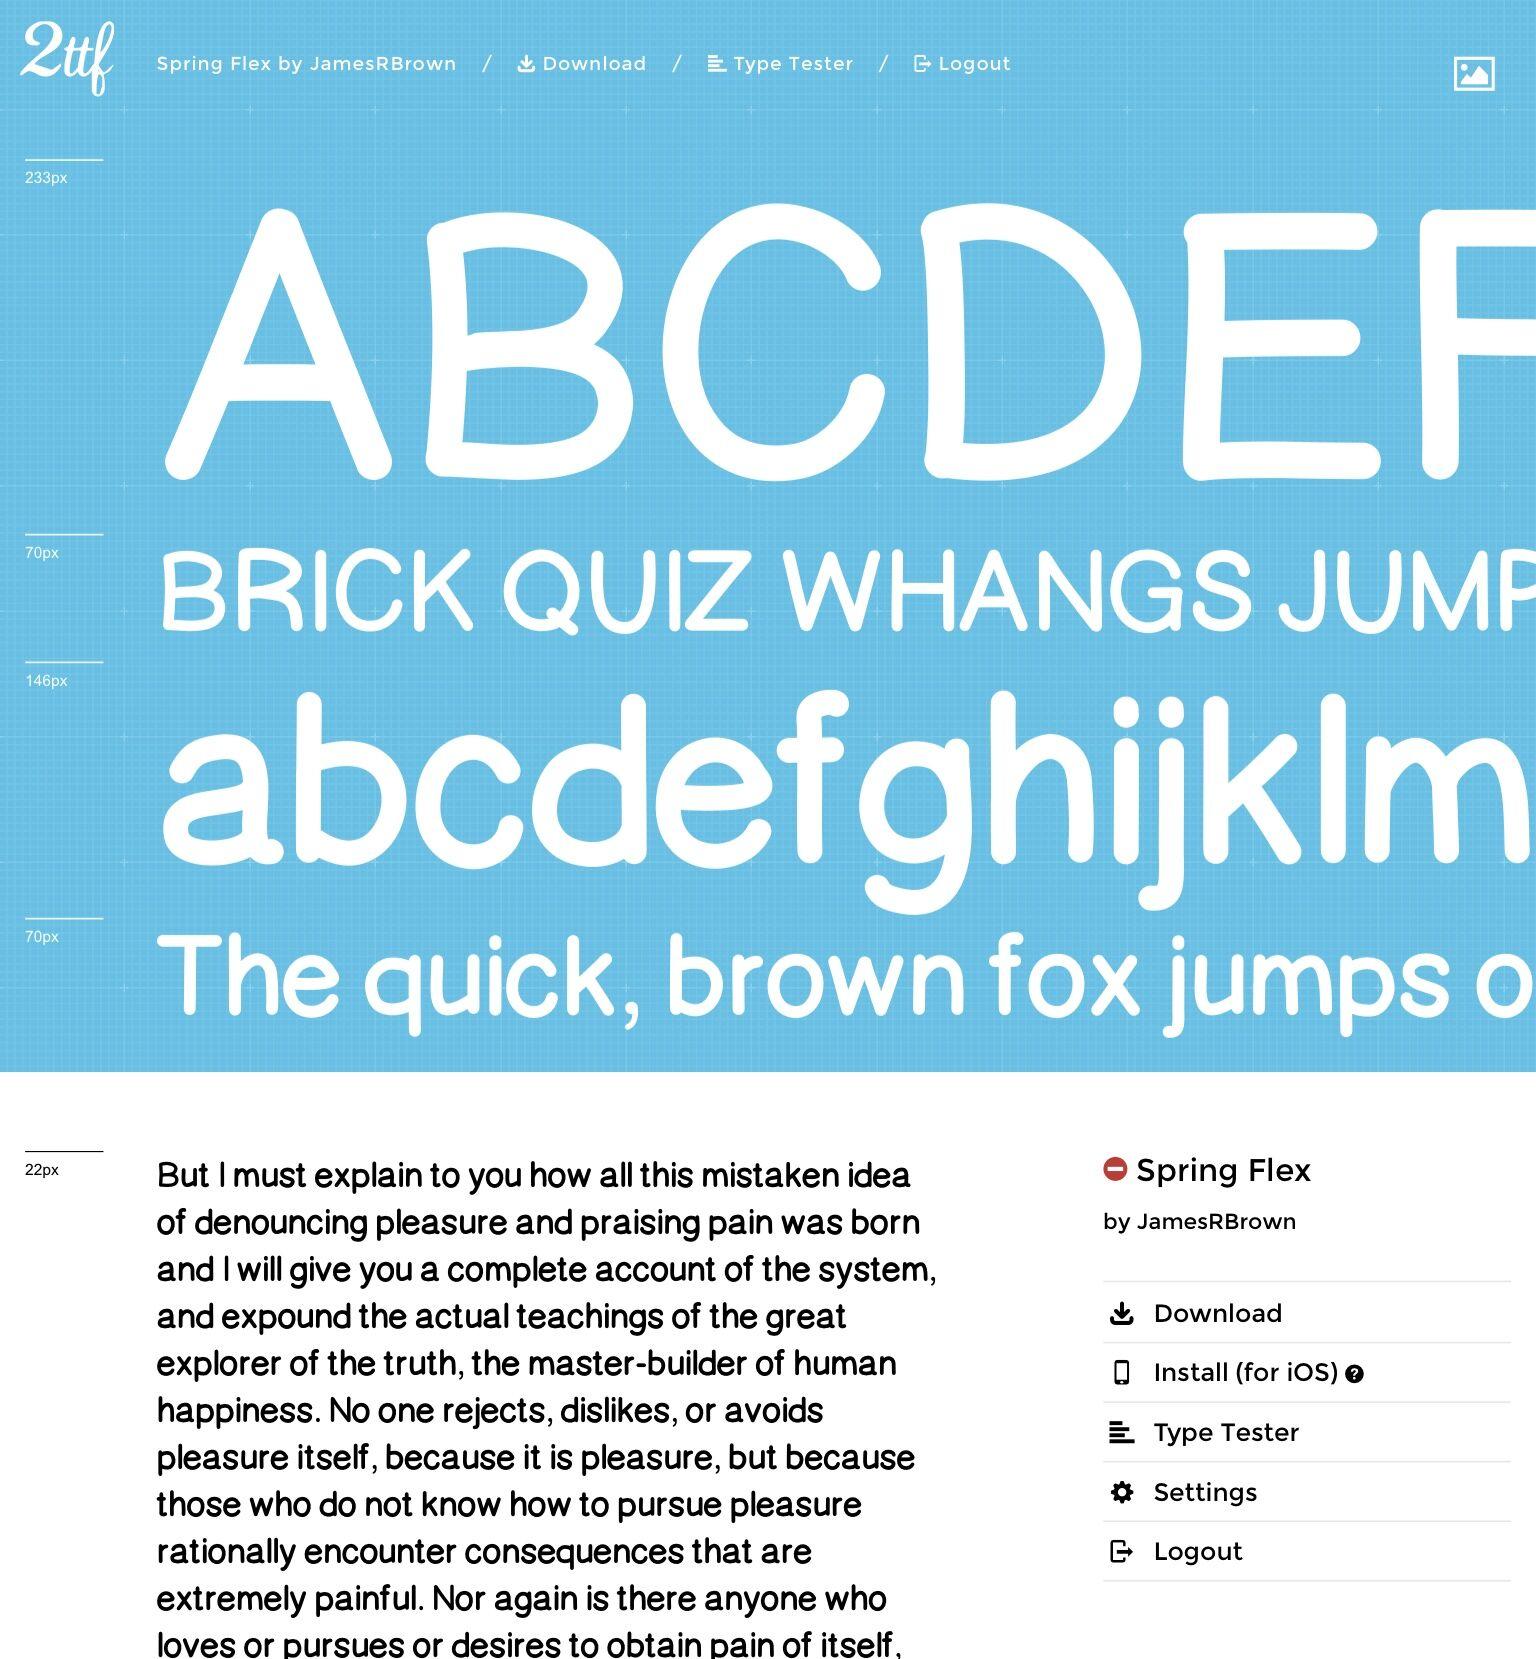 Spring Fling - Helvetica Font By JR Fonts and Designs